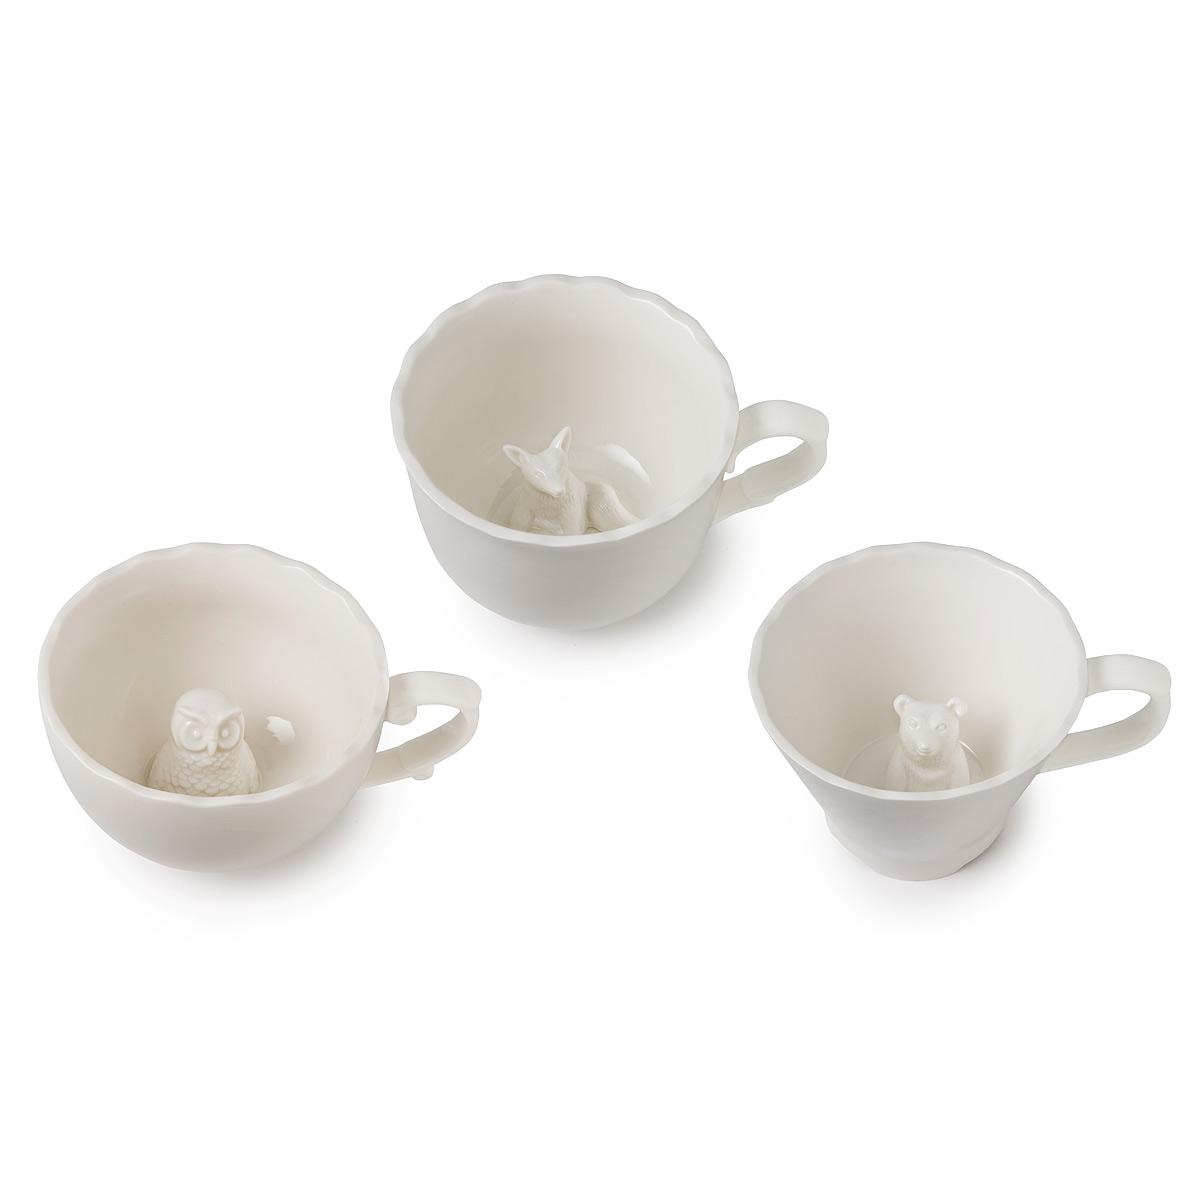 Hidden Animal Mugs China Tea Party Serveware Cup